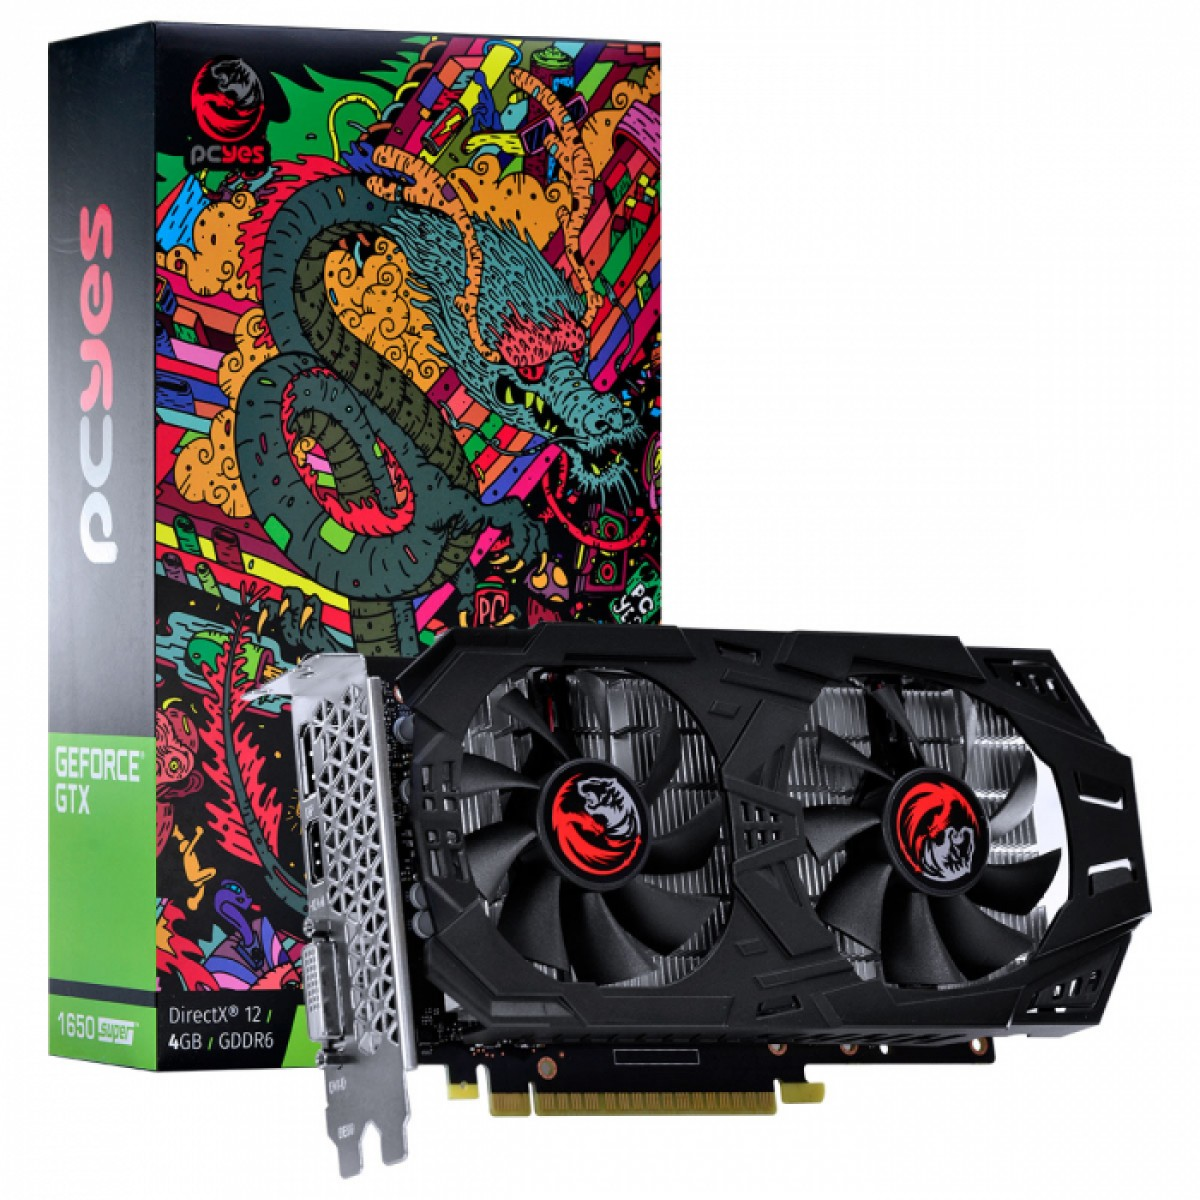 Placa de Vídeo PCyes GeForce GTX 1650 Super Graffiti Series, 4GB GDDR6, 128Bit, PA16504DR6128FS